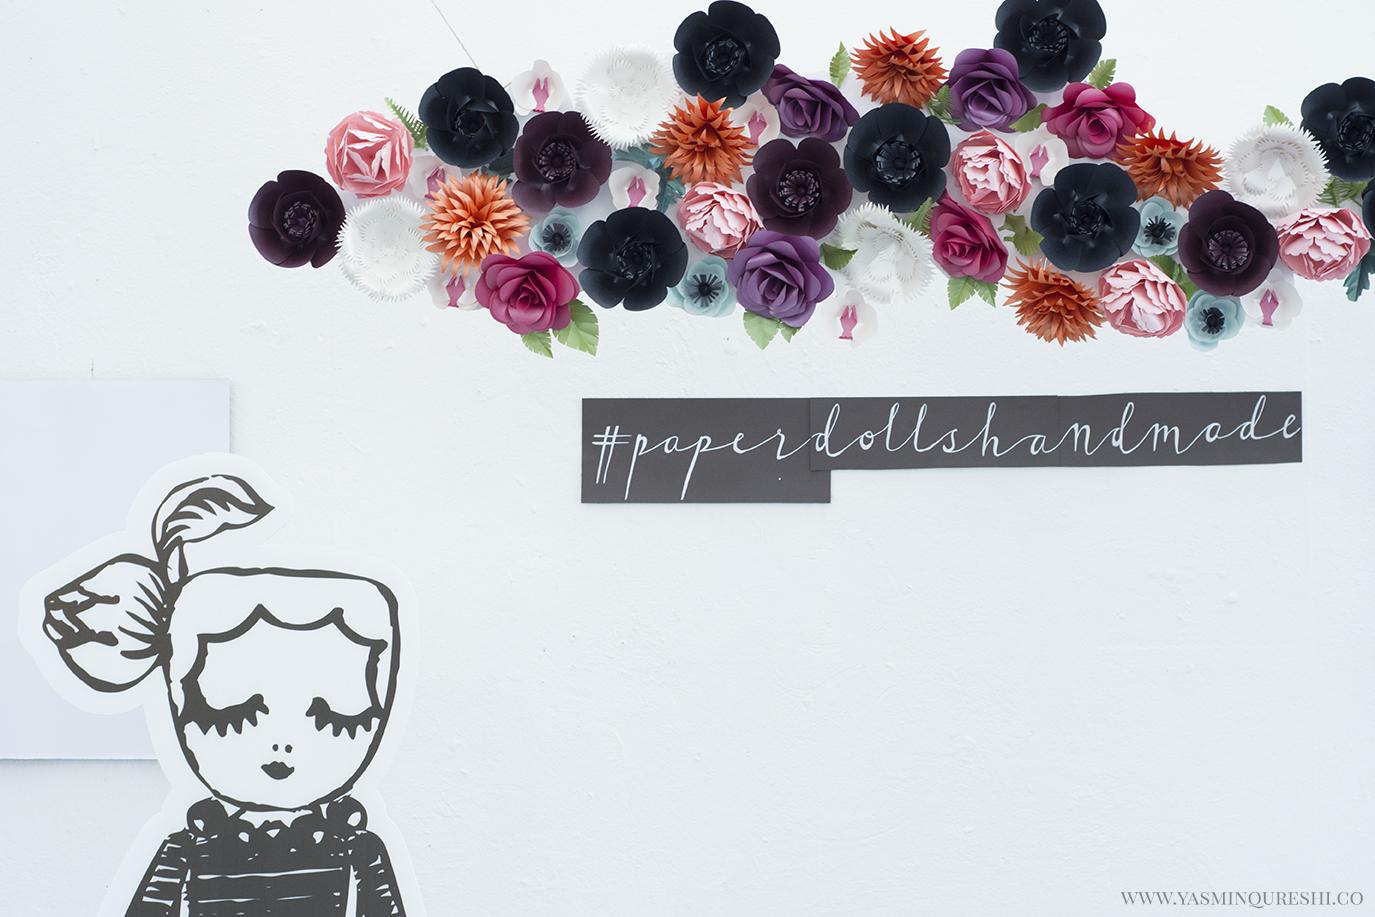 Paperdolls Handmade event, Yasmin Qureshi blog